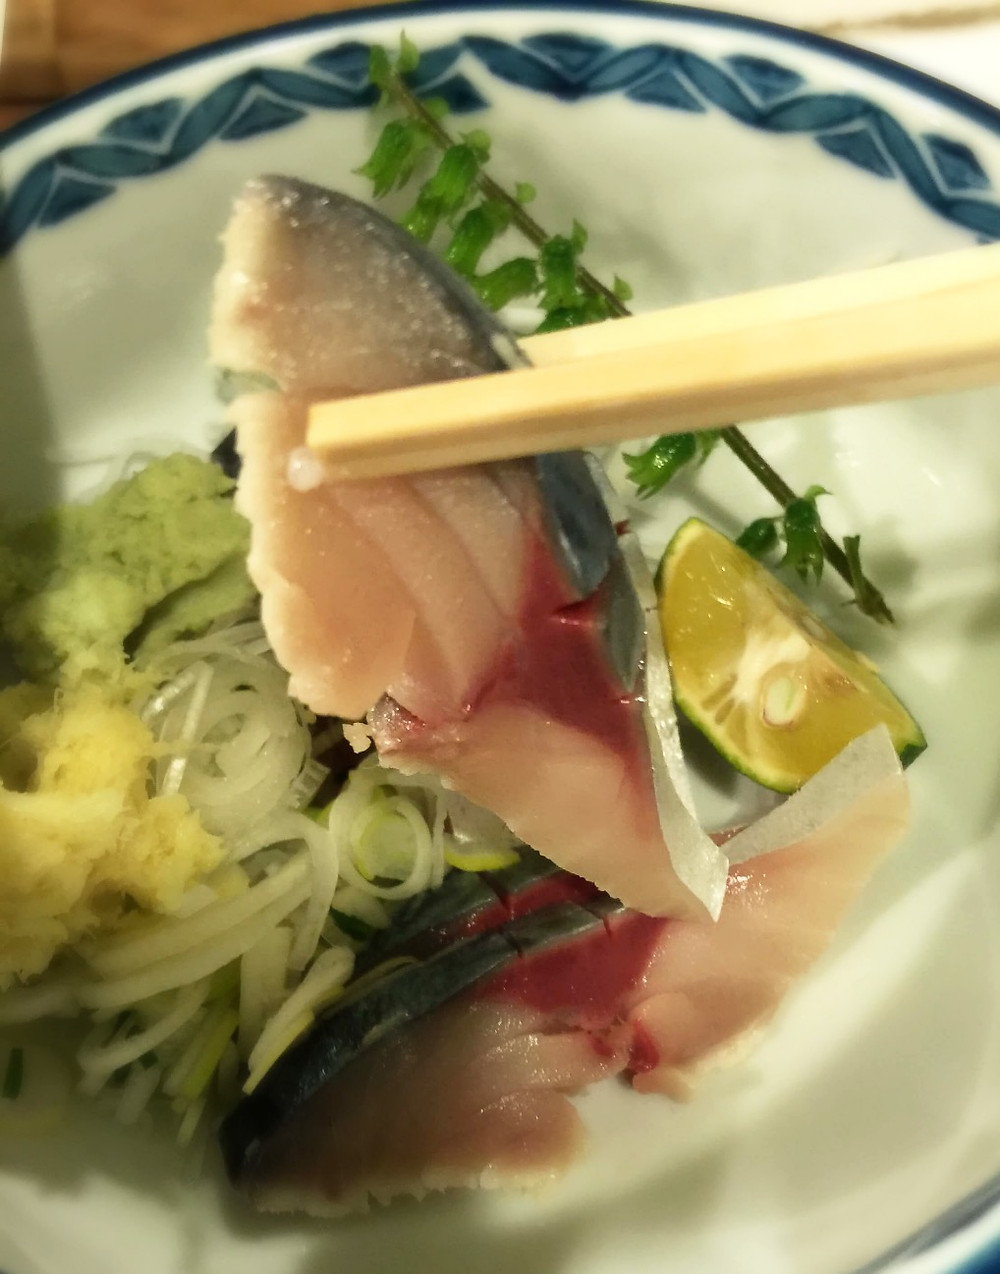 Shime-saba (marinated mackerel) @ Sanshuya